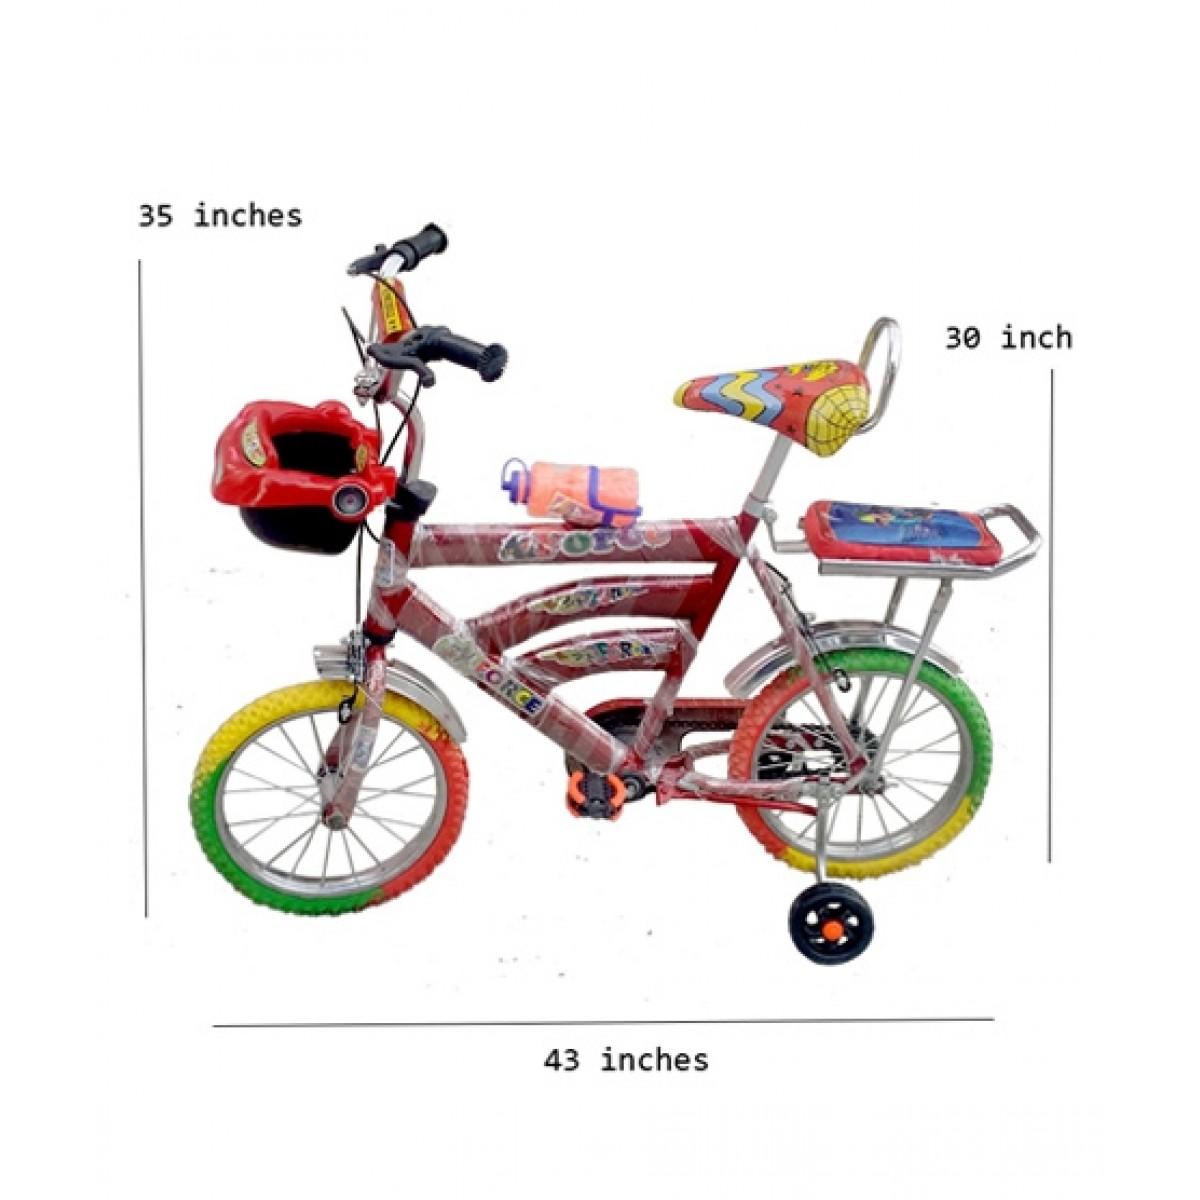 Y Ali 16 Inch Mountain Bike For Kids Price In Pakistan Buy Y Ali